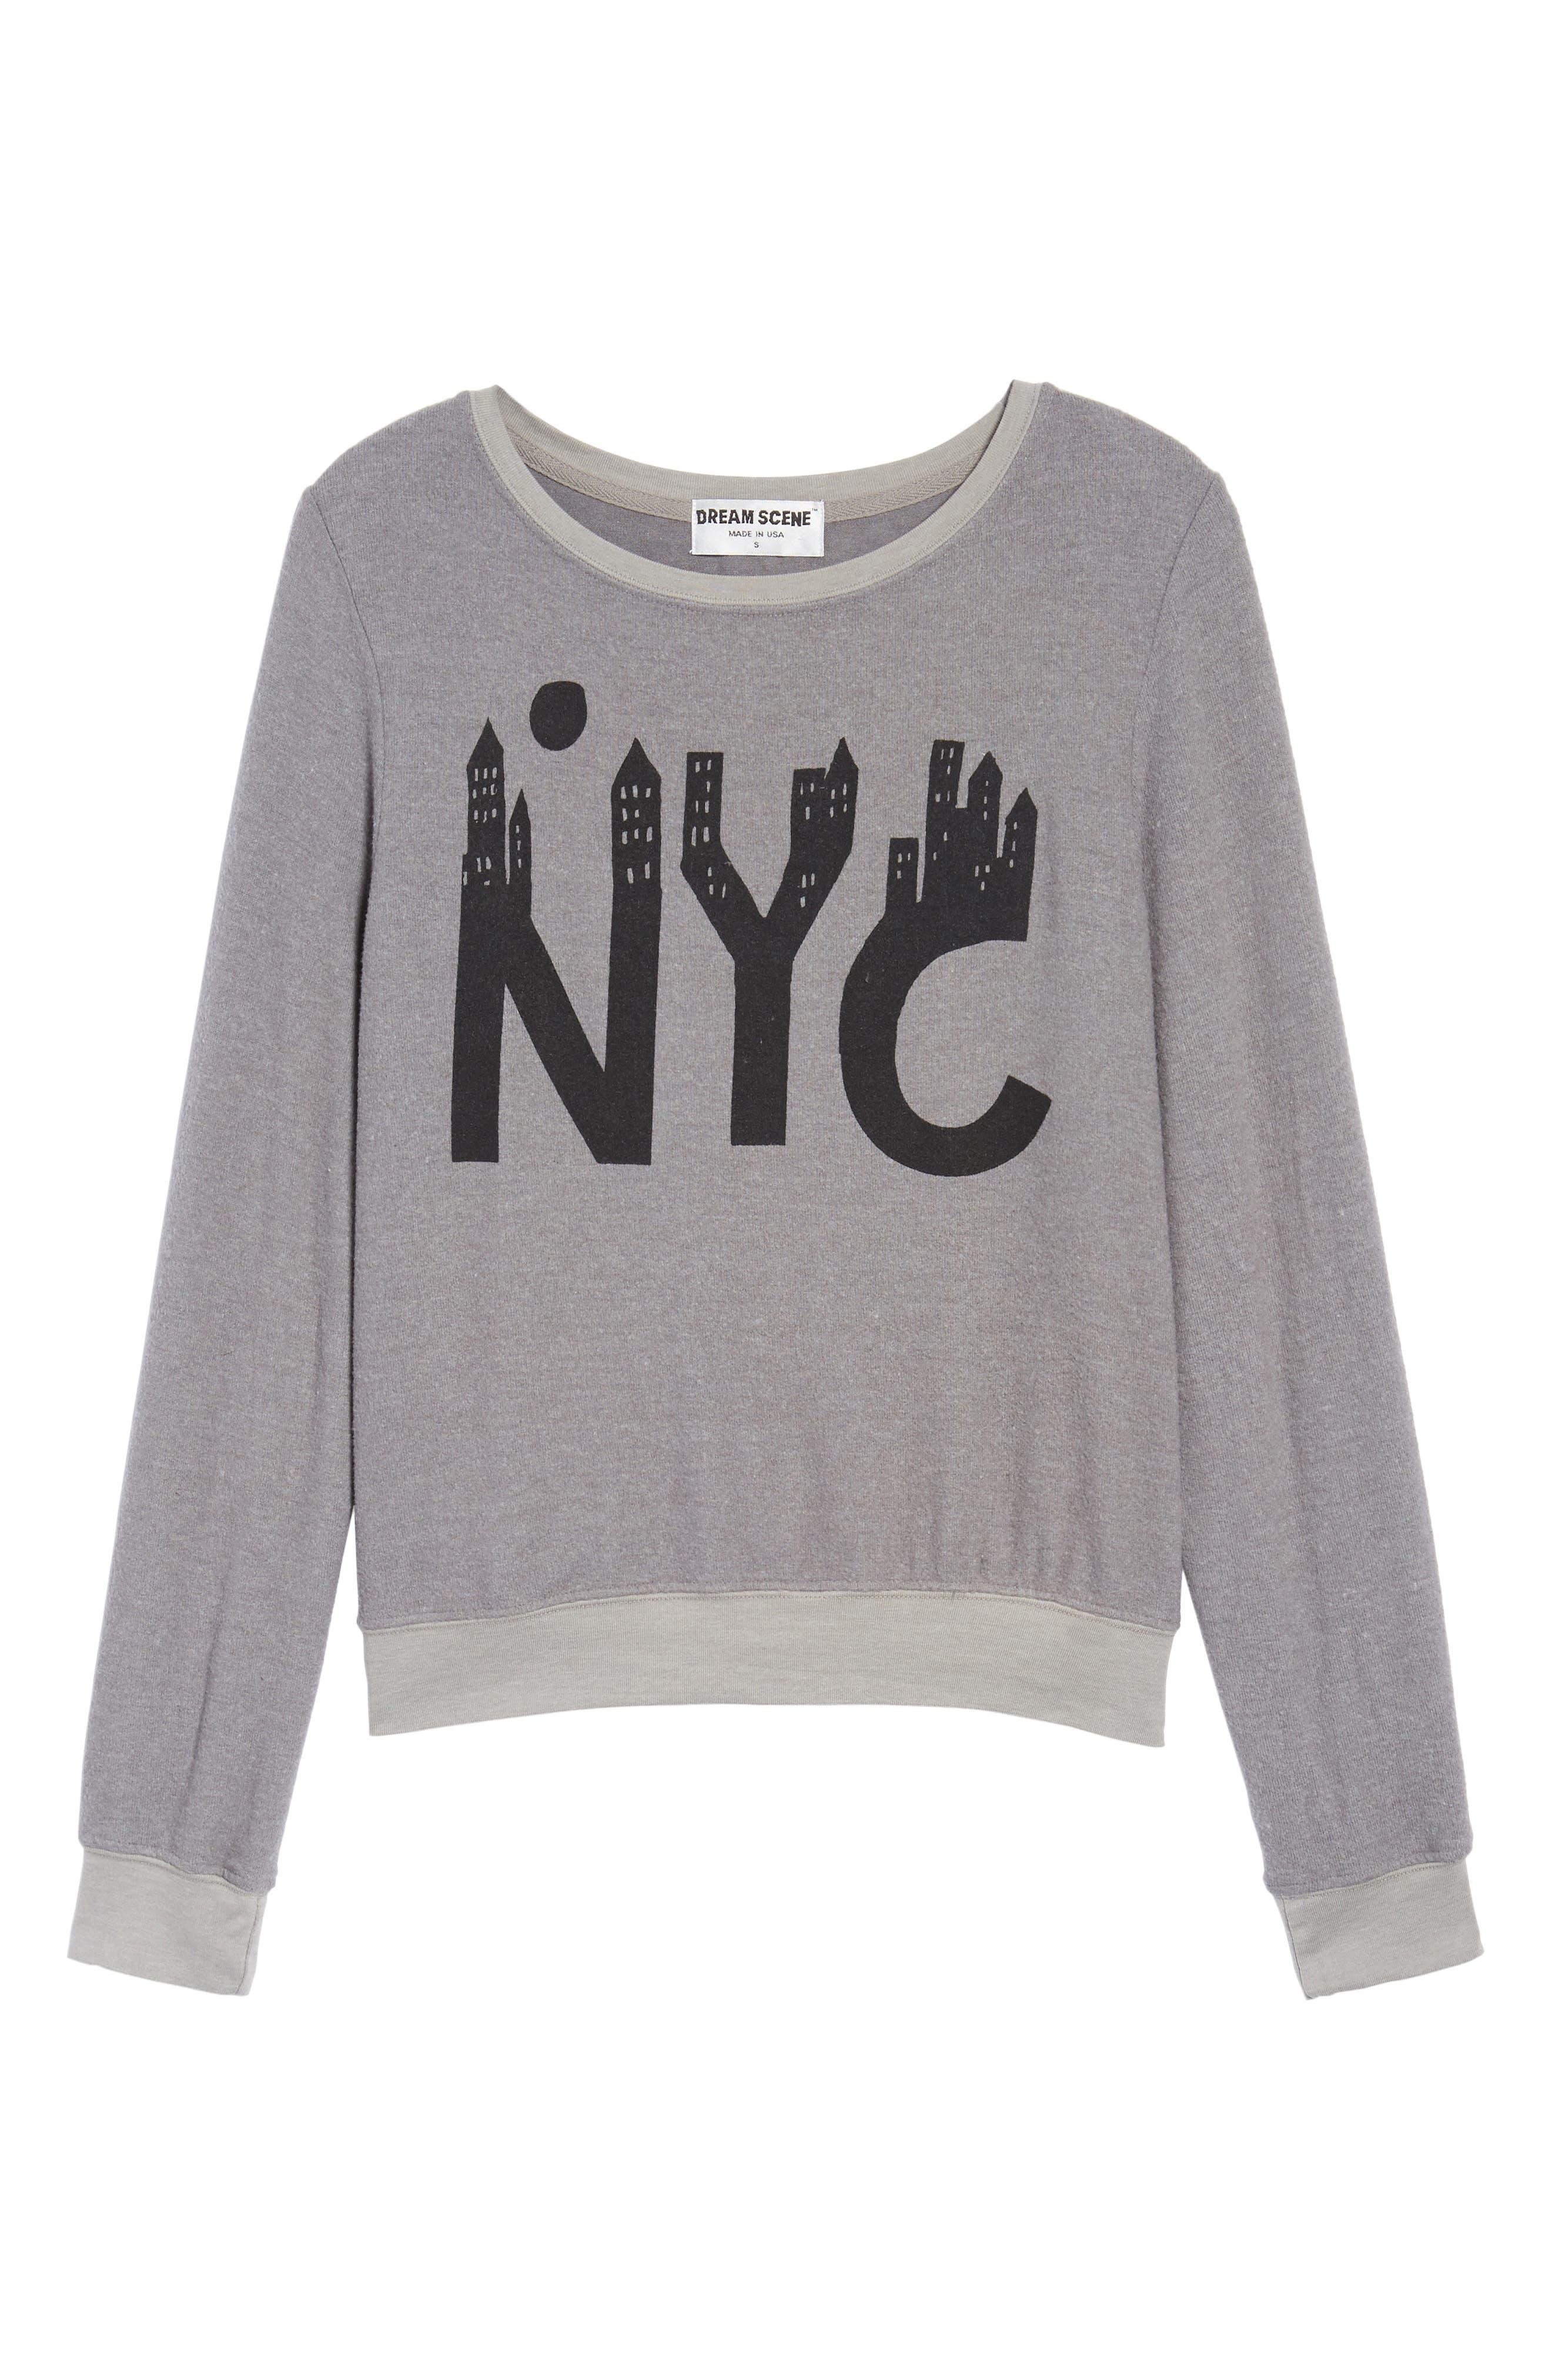 NYC Sweatshirt,                             Alternate thumbnail 6, color,                             Vintage Grey